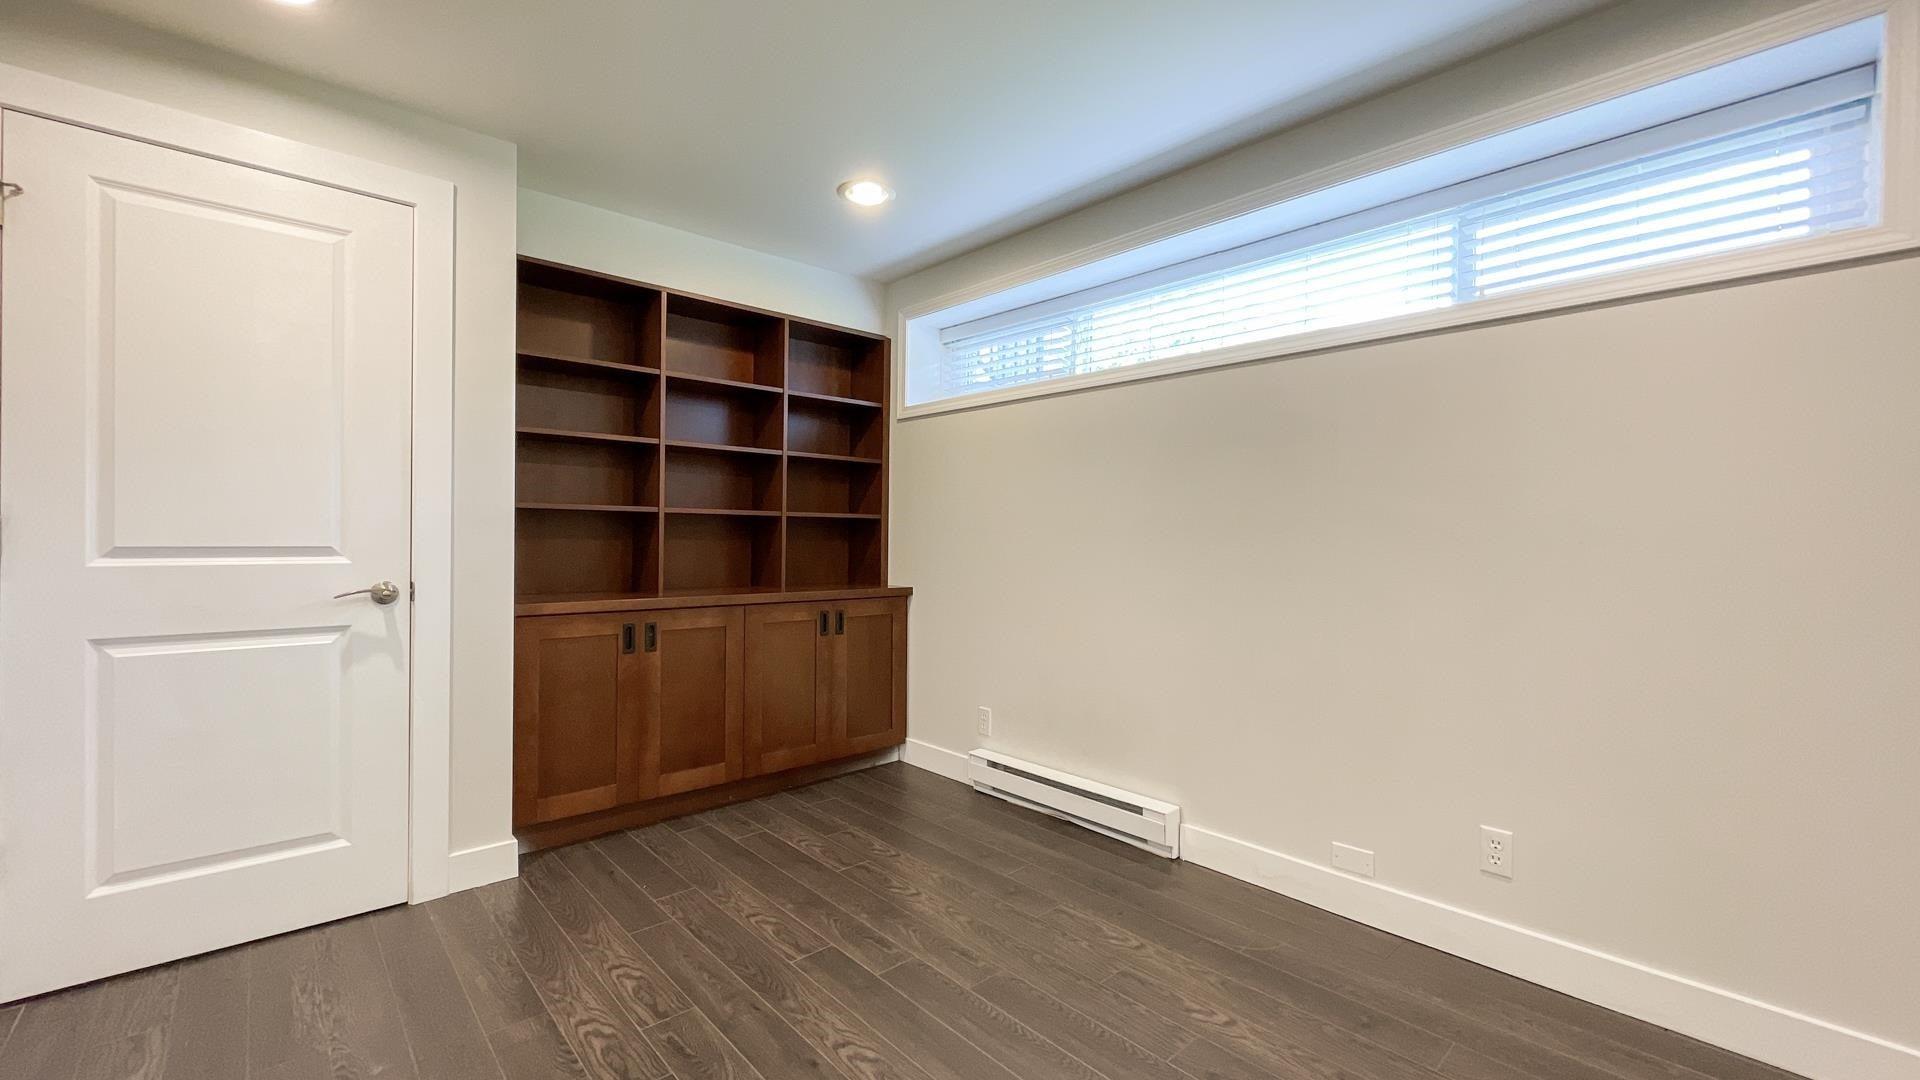 1168 JEFFERSON AVENUE - Ambleside House/Single Family for sale, 6 Bedrooms (R2602275) - #17